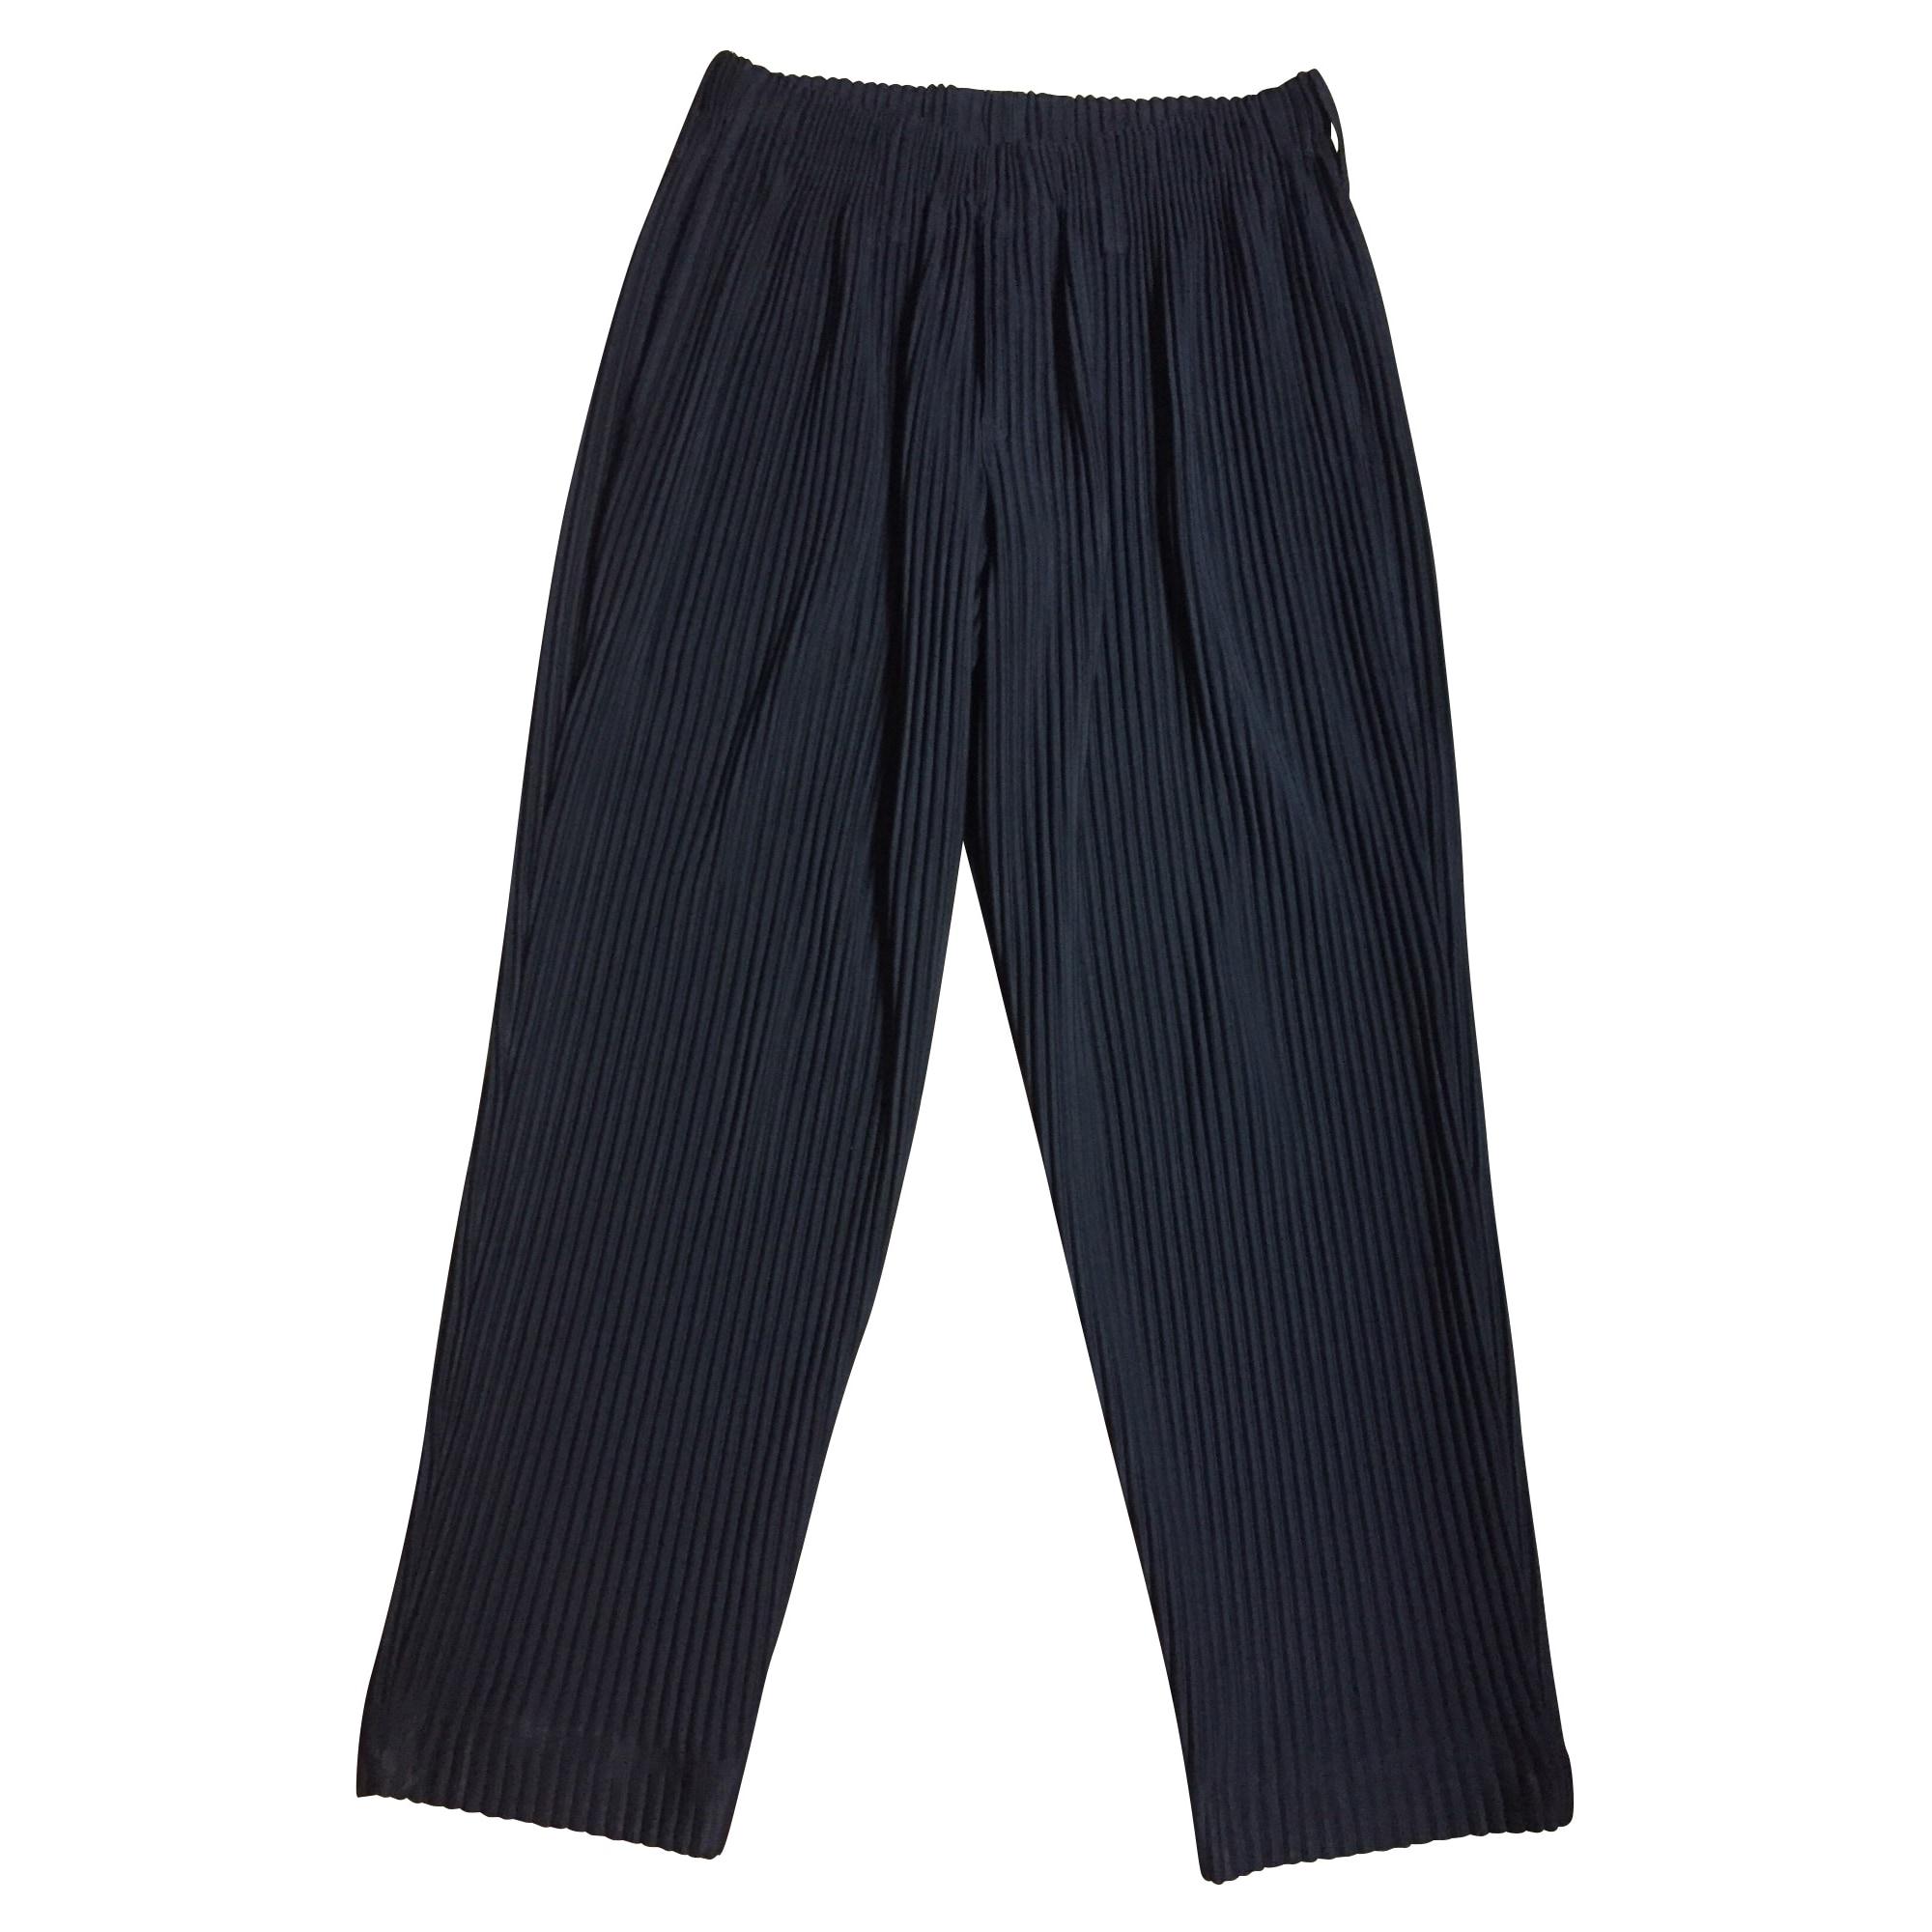 Pantalon droit ISSEY MIYAKE Noir